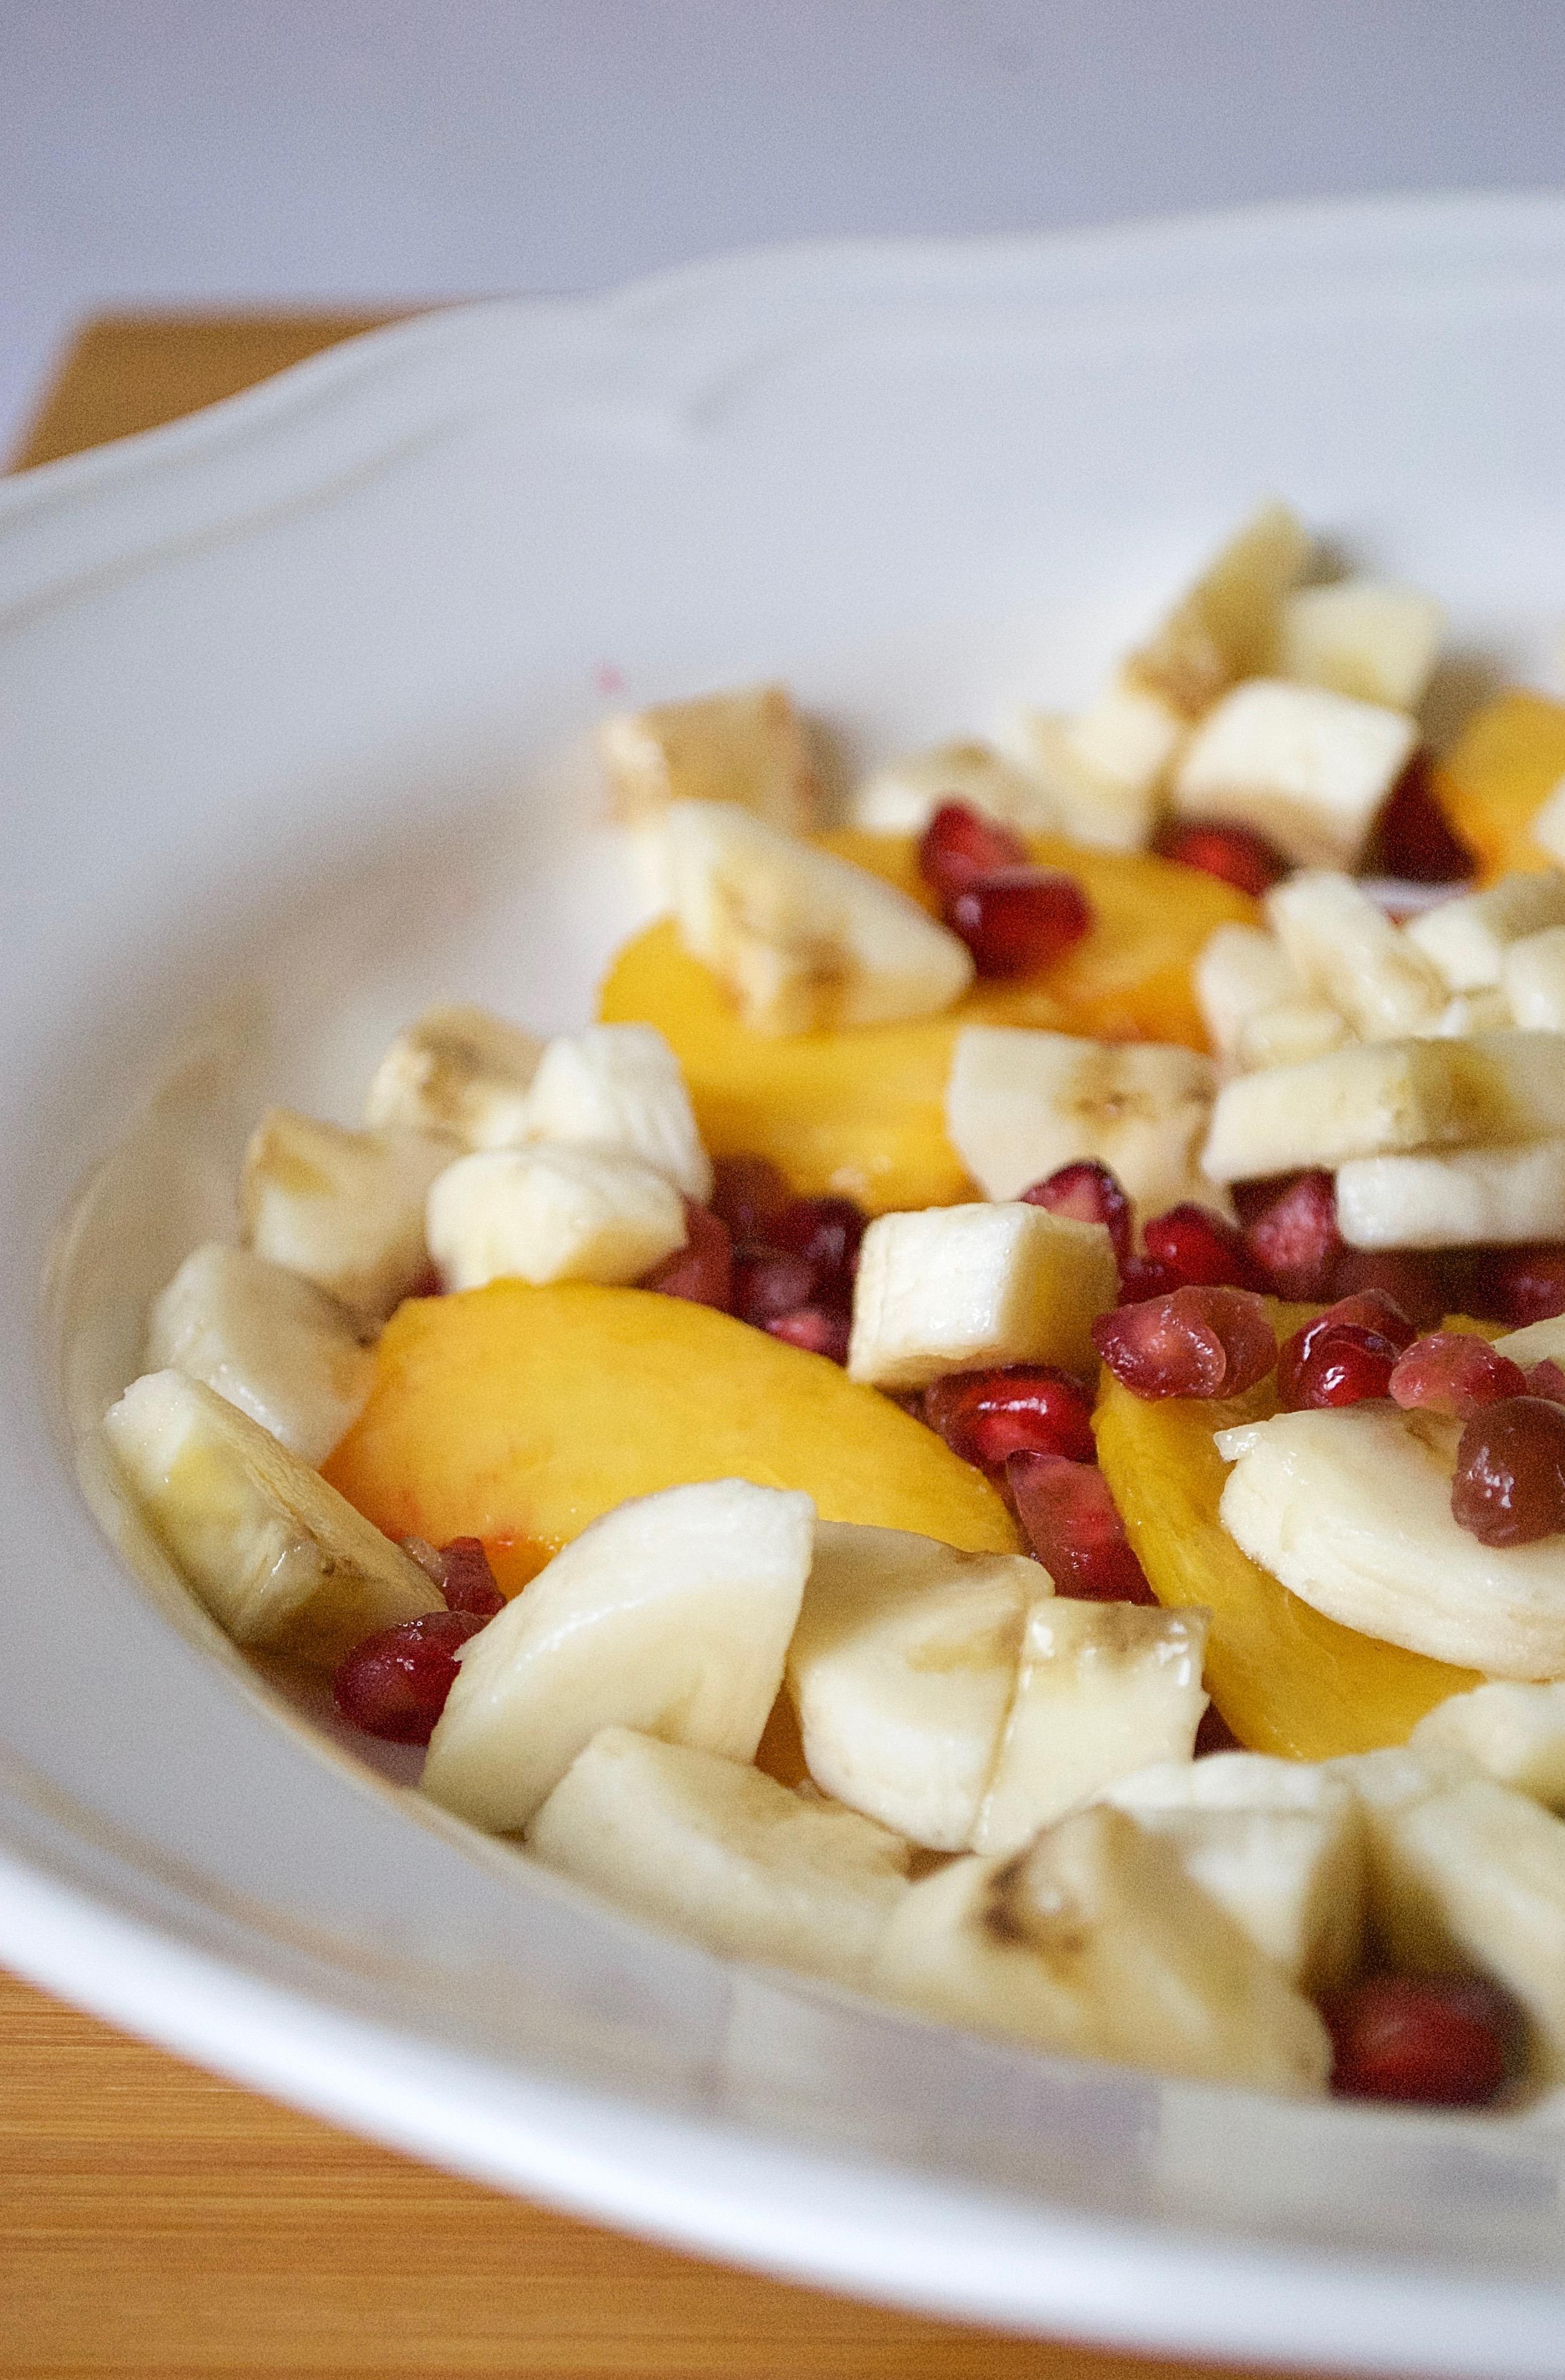 Banana, Peach and Pomegranate Fruit Salad